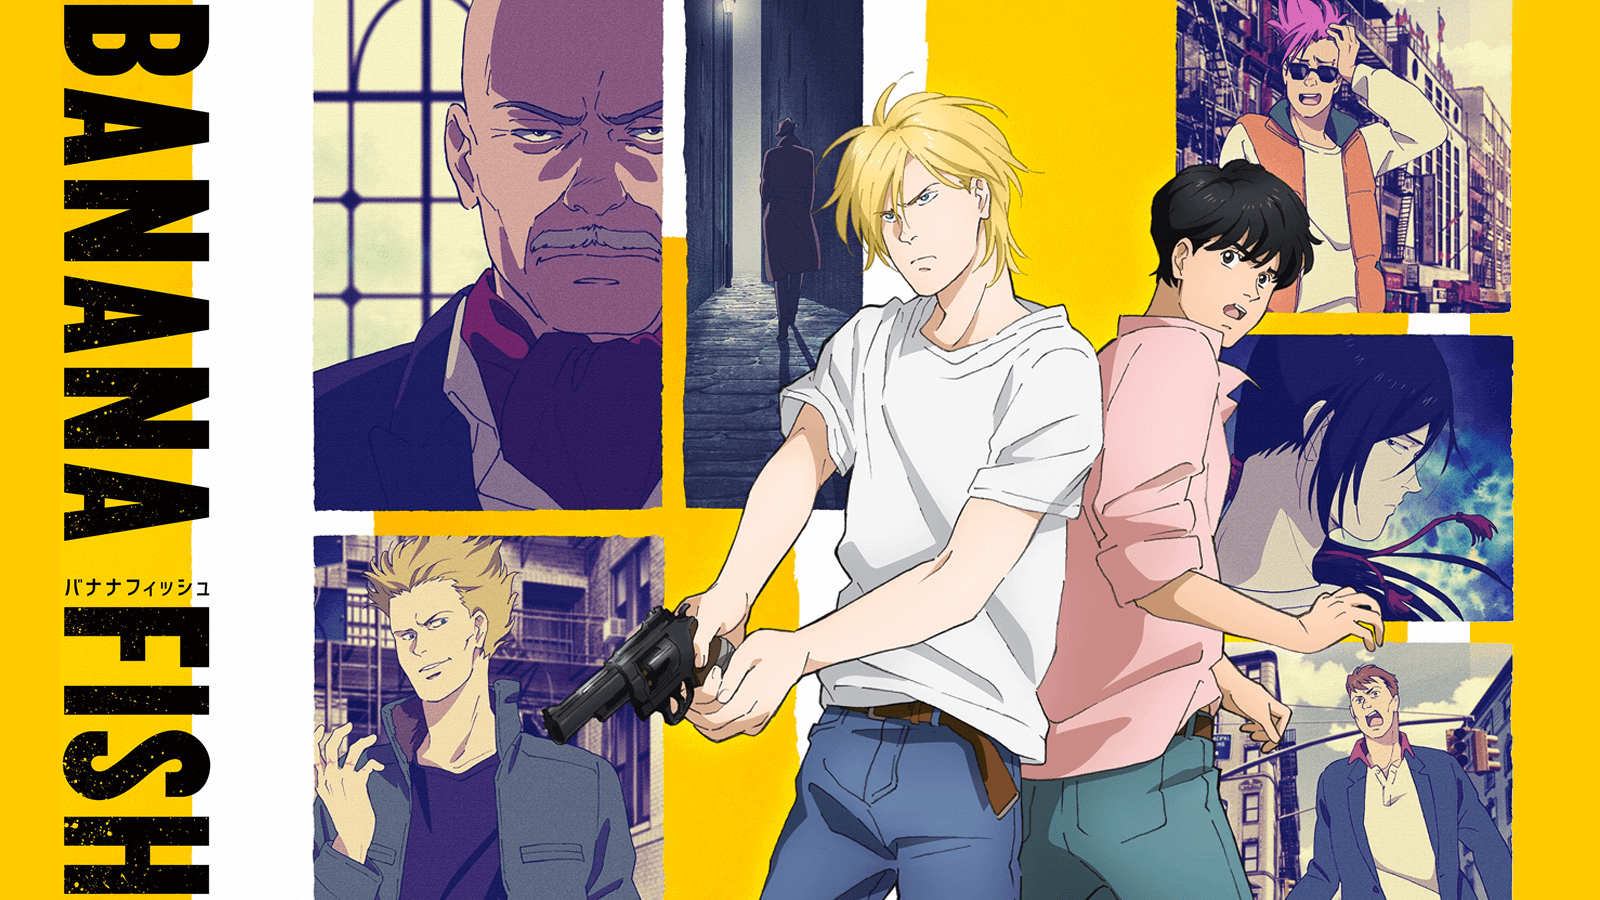 Banana Fish Director 'Utsumi Hiroko', Anime Studio BONES Announce New Original TV Anime Project